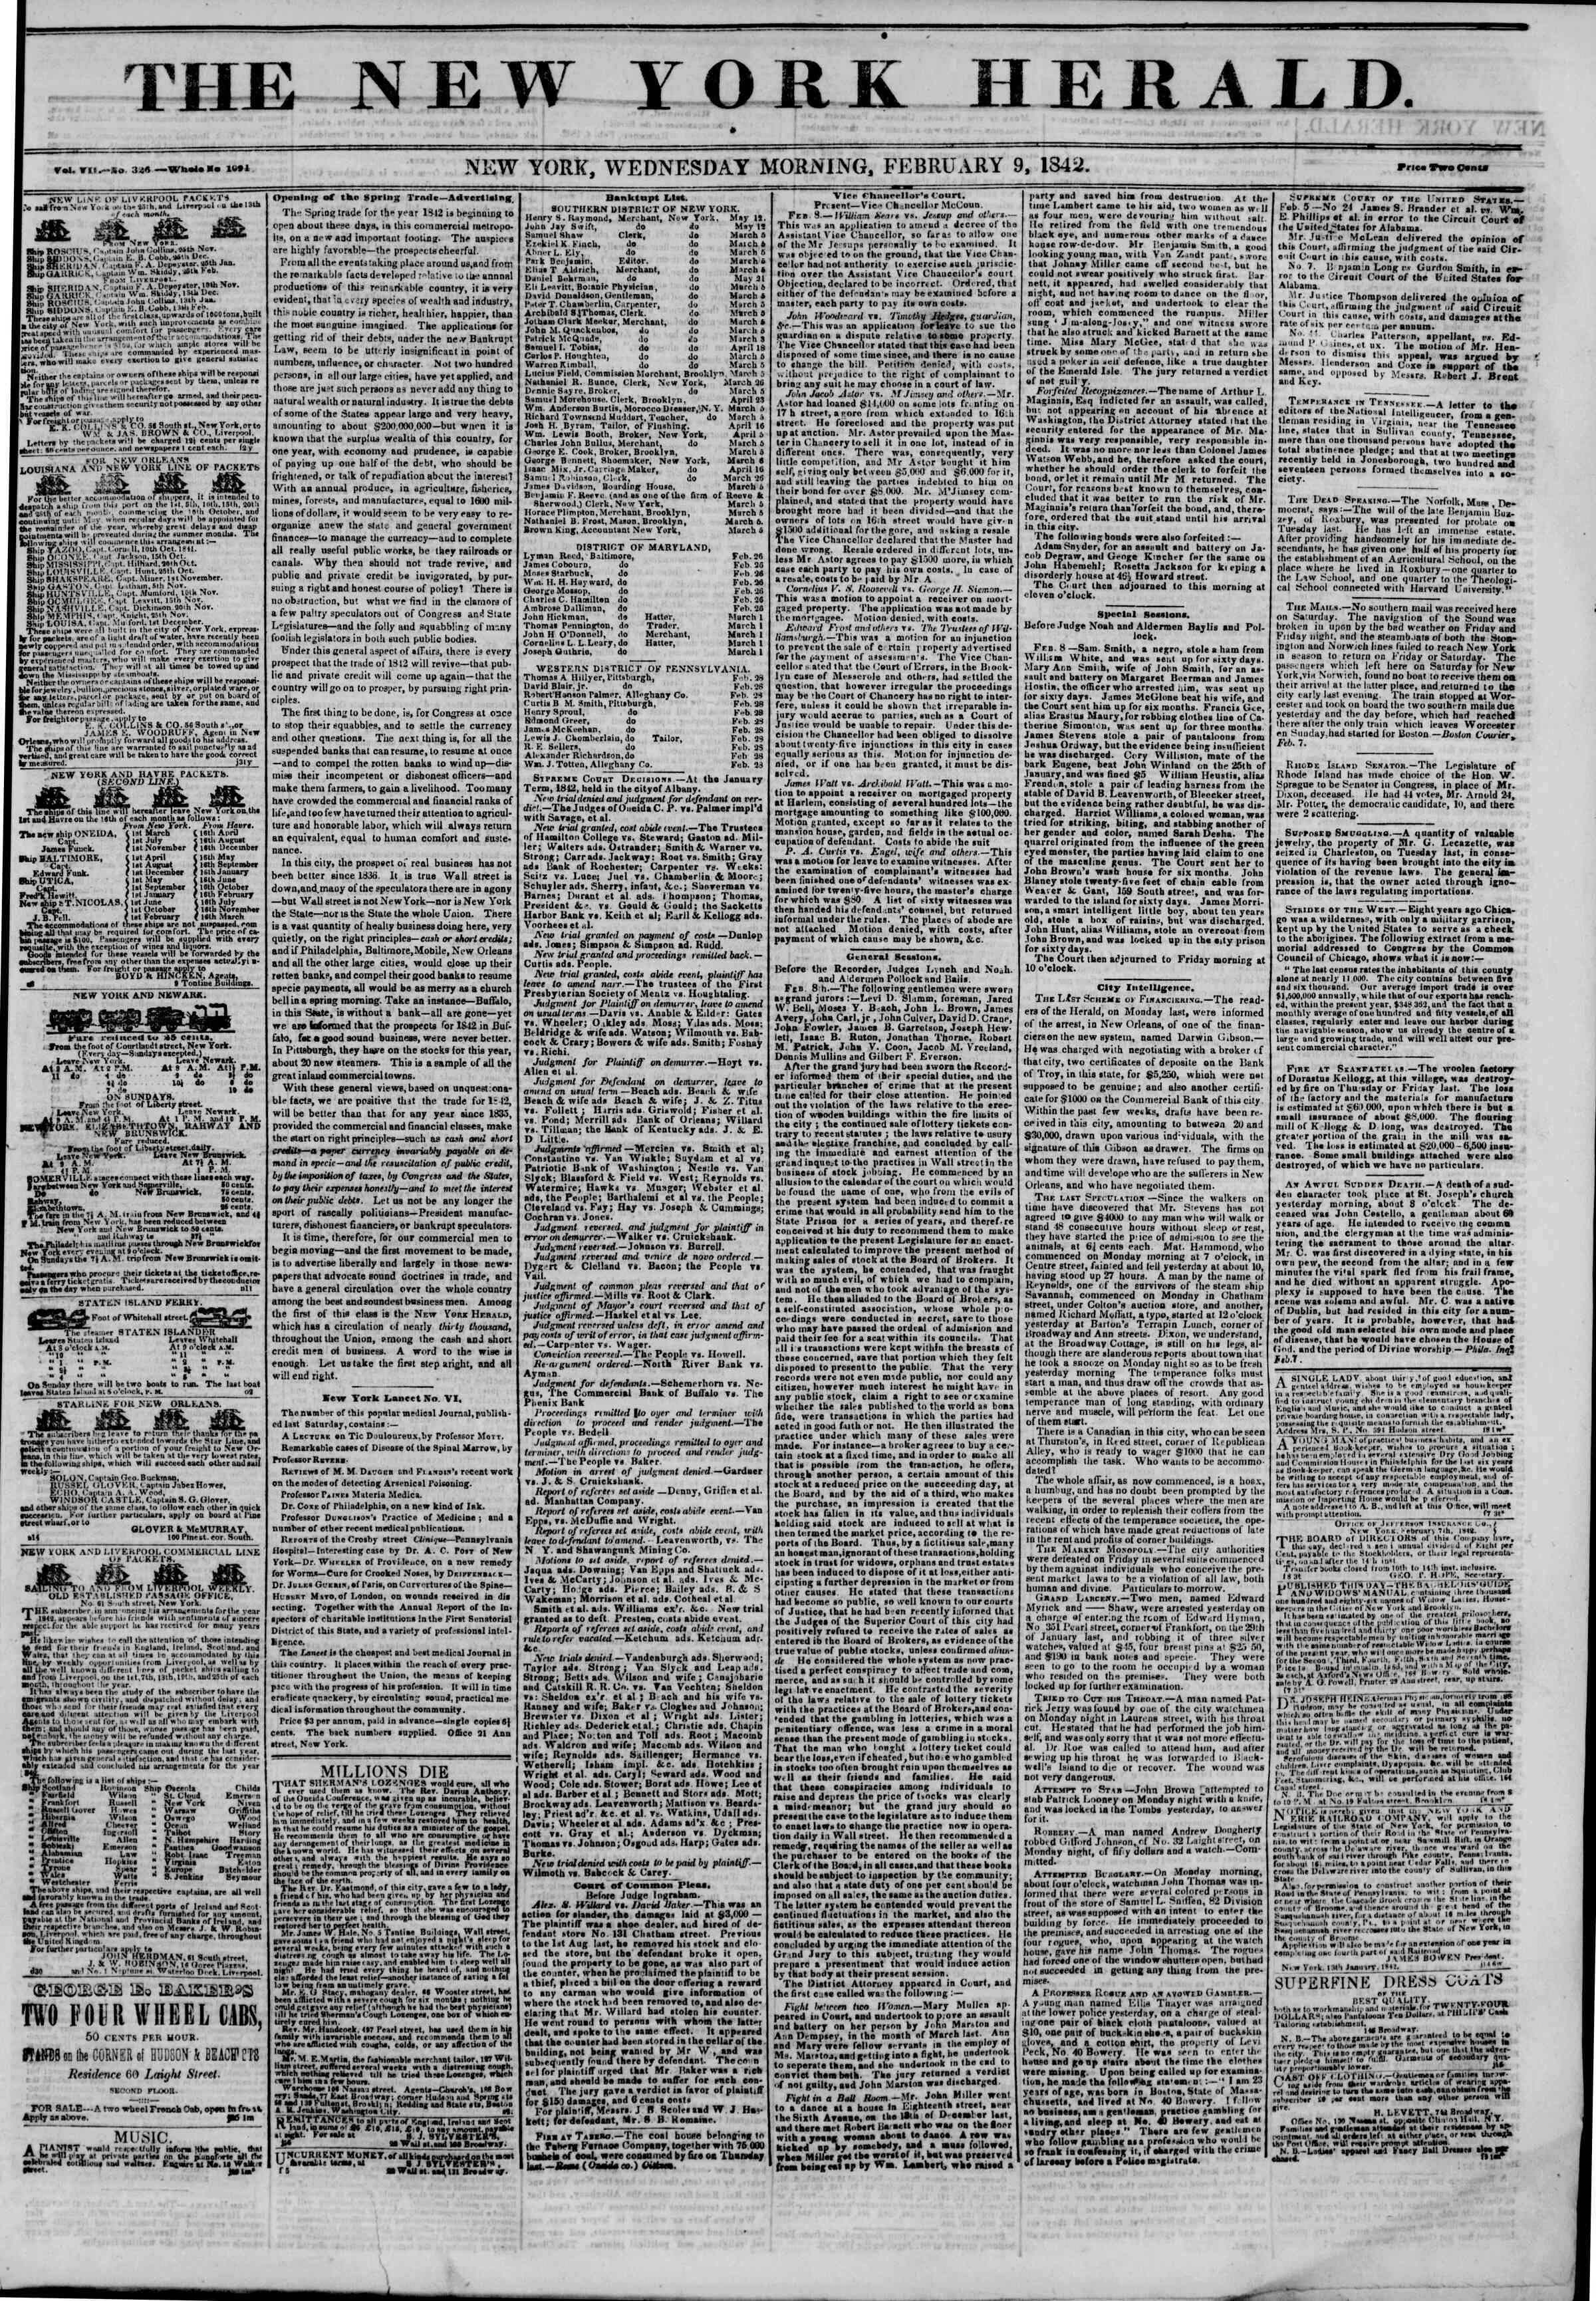 February 9, 1842 Tarihli The New York Herald Gazetesi Sayfa 1